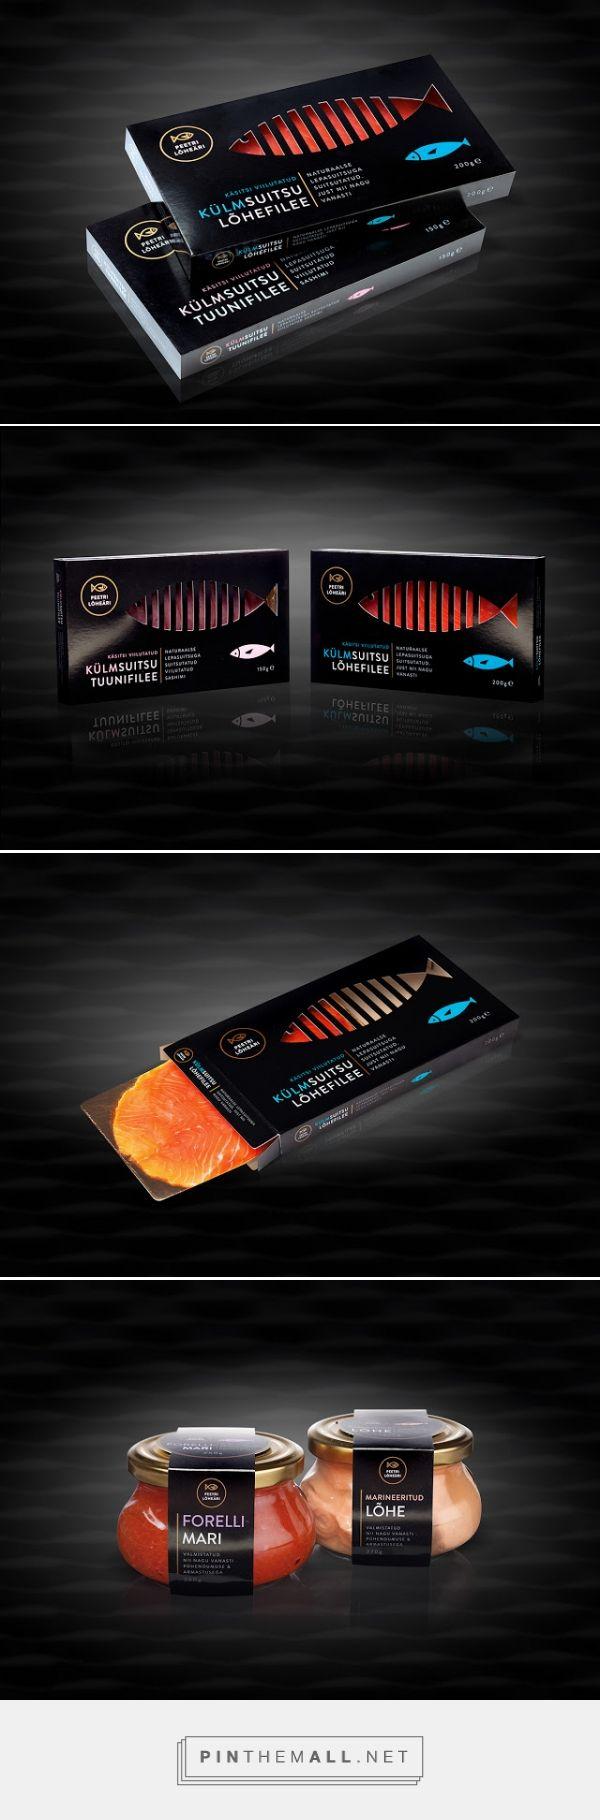 Peetri Lõheäri #Fish #Packaging designed by Koor - http://www.packagingoftheworld.com/2015/04/peetri-loheari-fish-packaging.html